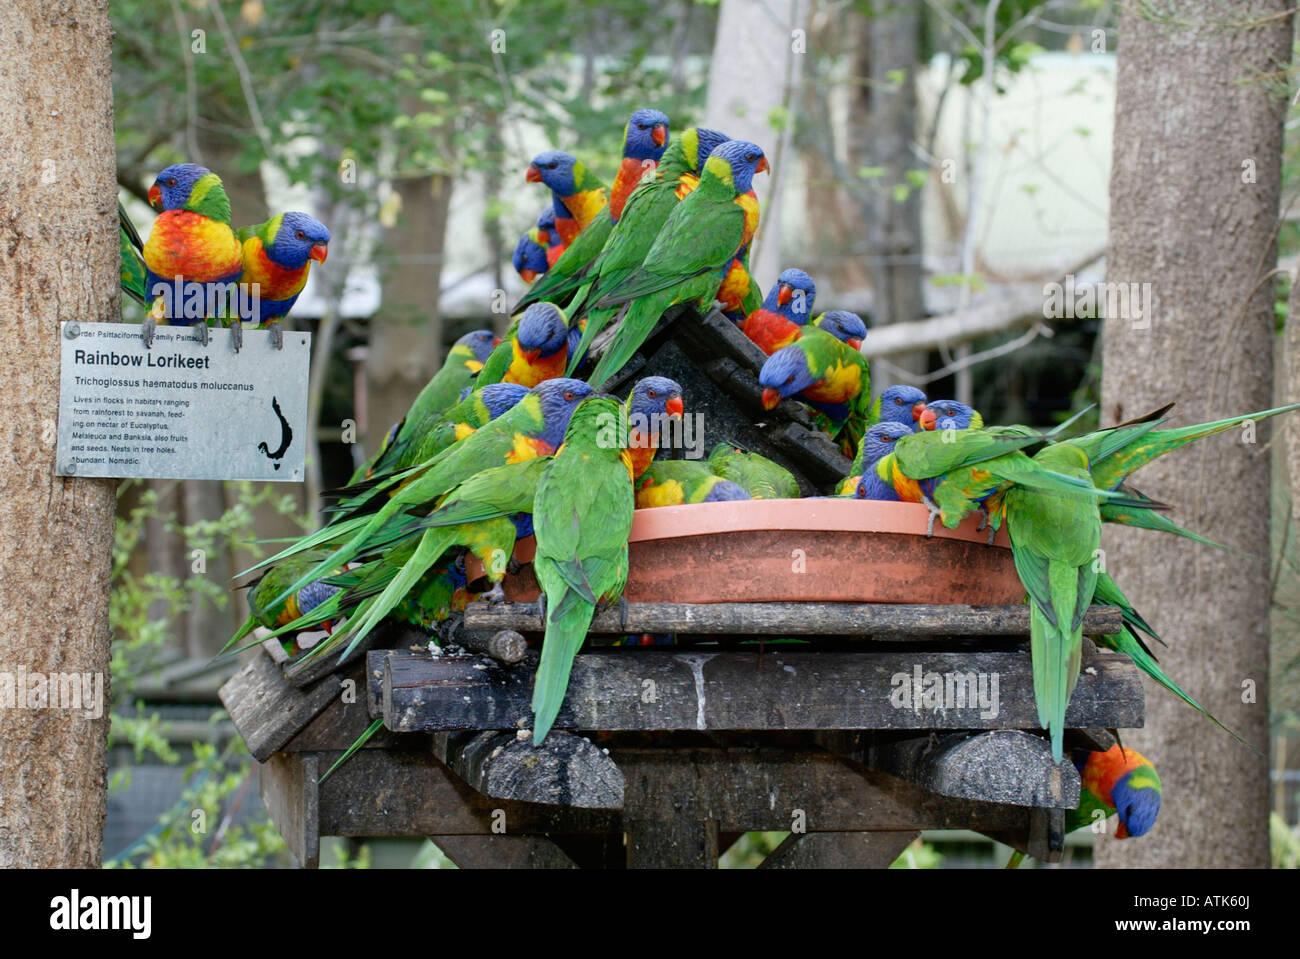 Rainbow Lory / Regenbogenlori / Gebirgslori Stock Photo